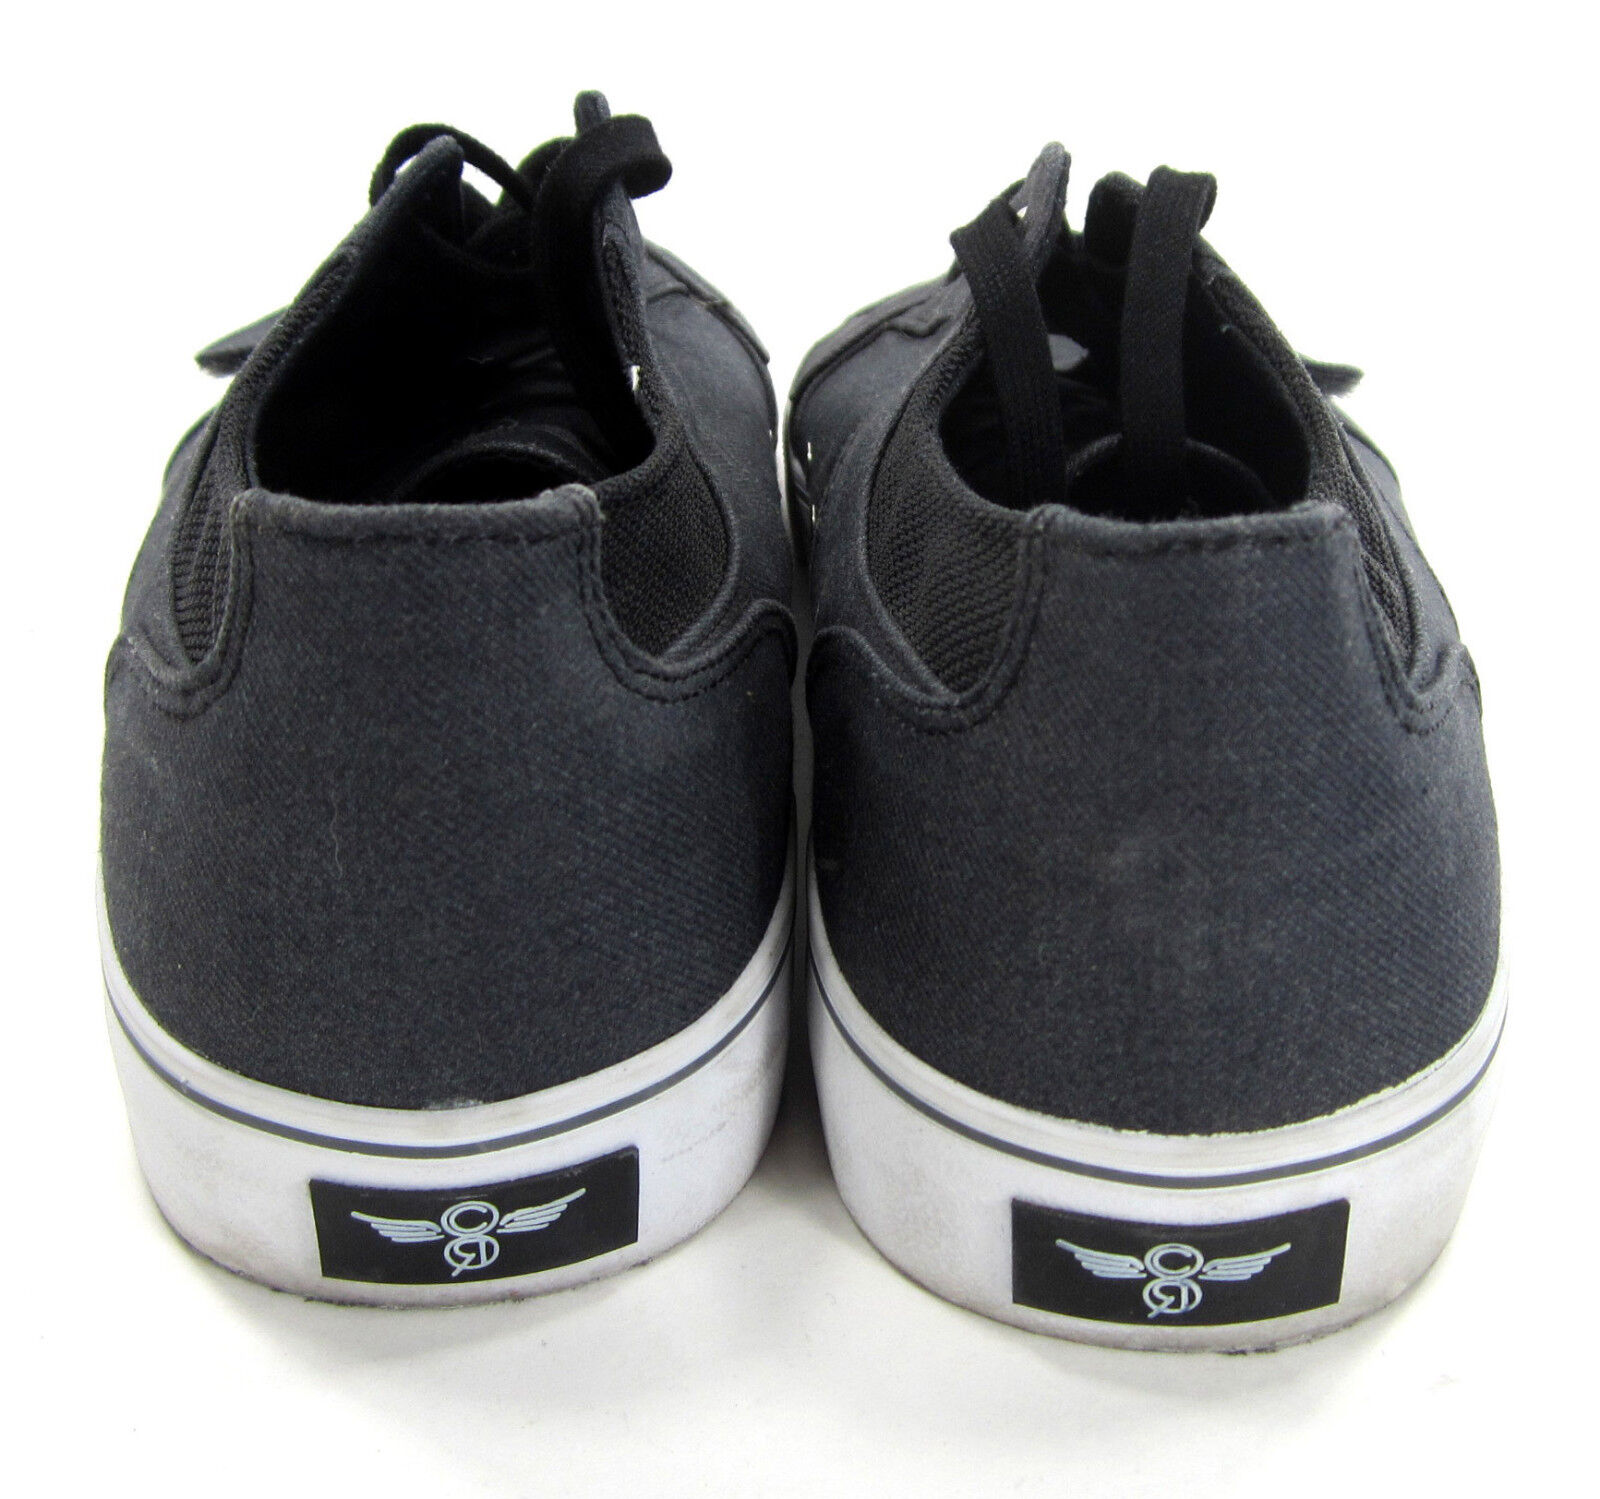 Creative Dark Recreation Schuhes Cesario Lo Dark Creative Gray Sneakers Größe 11.5 0ed81d